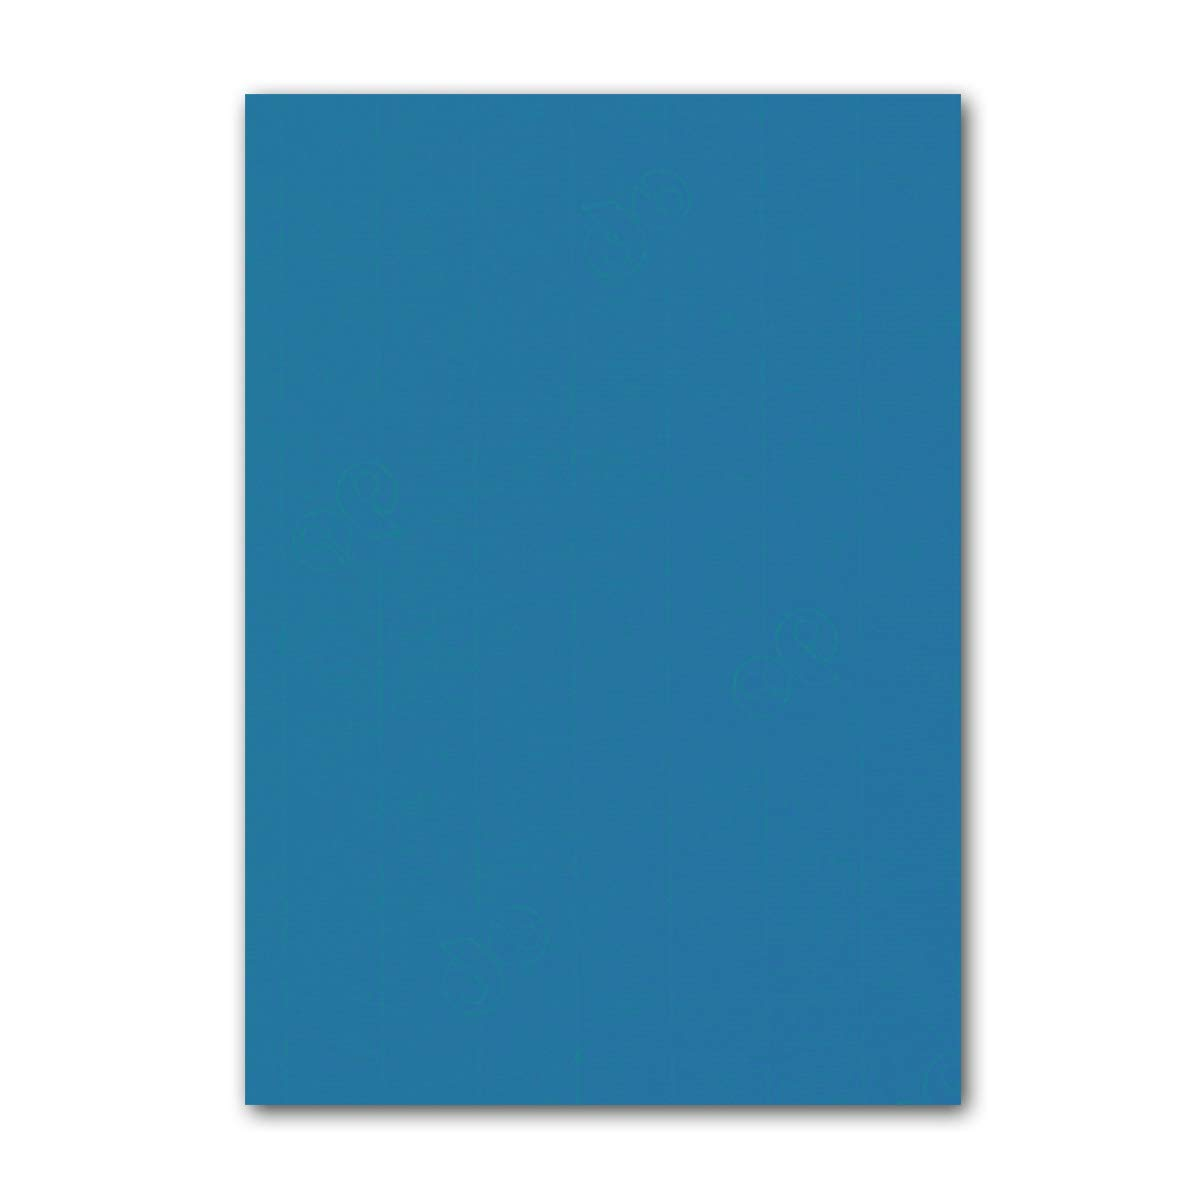 ARTOZ 150x Briefpapier + Bastelpapier Bastelkarton - Taupe - DIN A4 297 x 210 mm – Edle Egoutteur-Rippung – Hochwertiges 220 g m² Tonpapier – Scrapbooking Papier 395 - Petrolblau 100 Stück